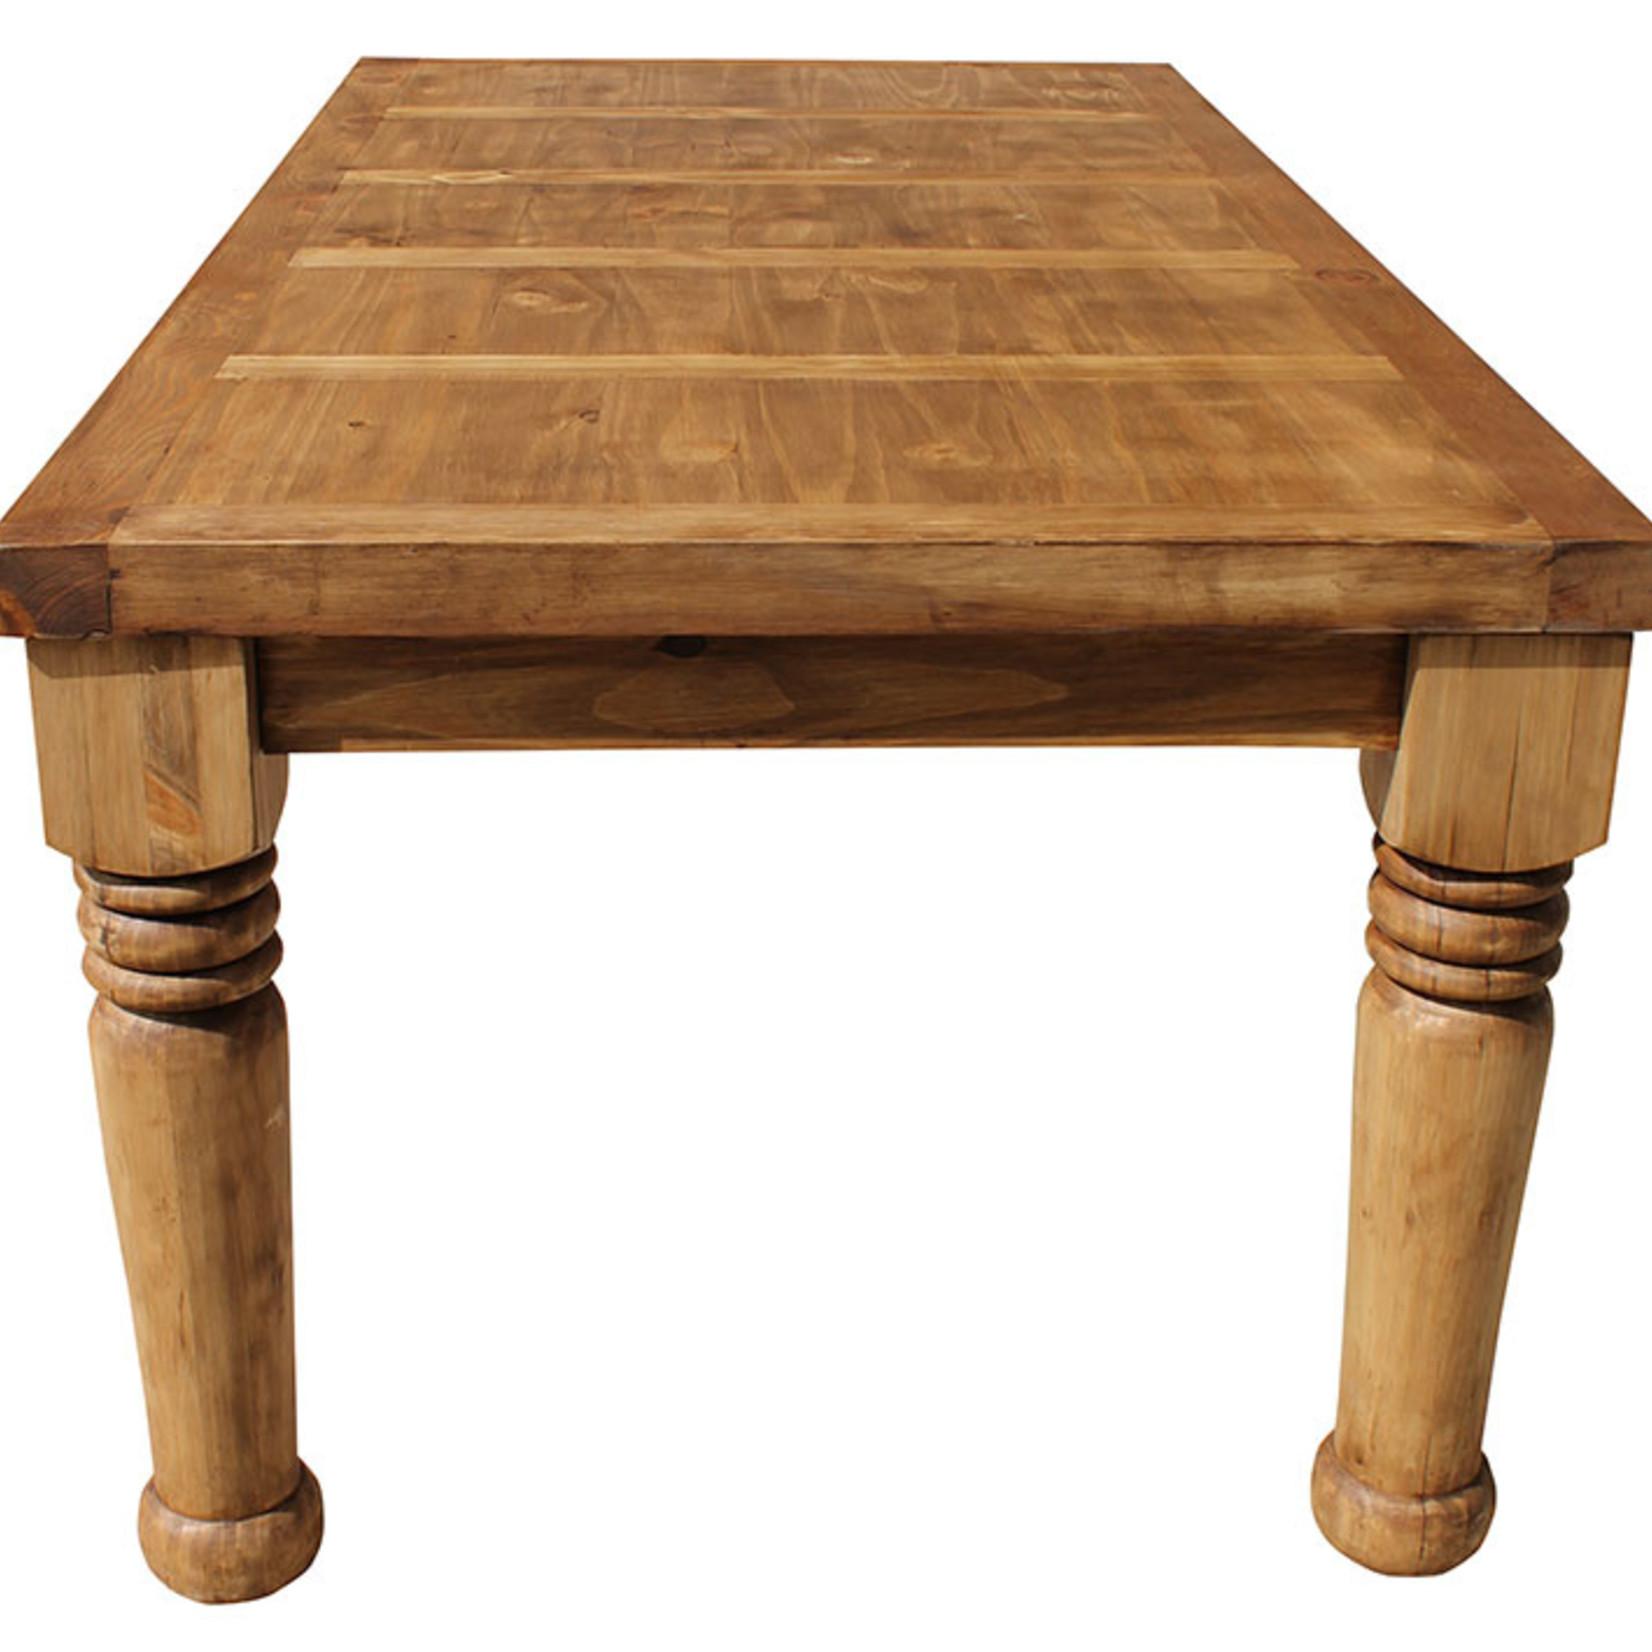 Ranchera Table